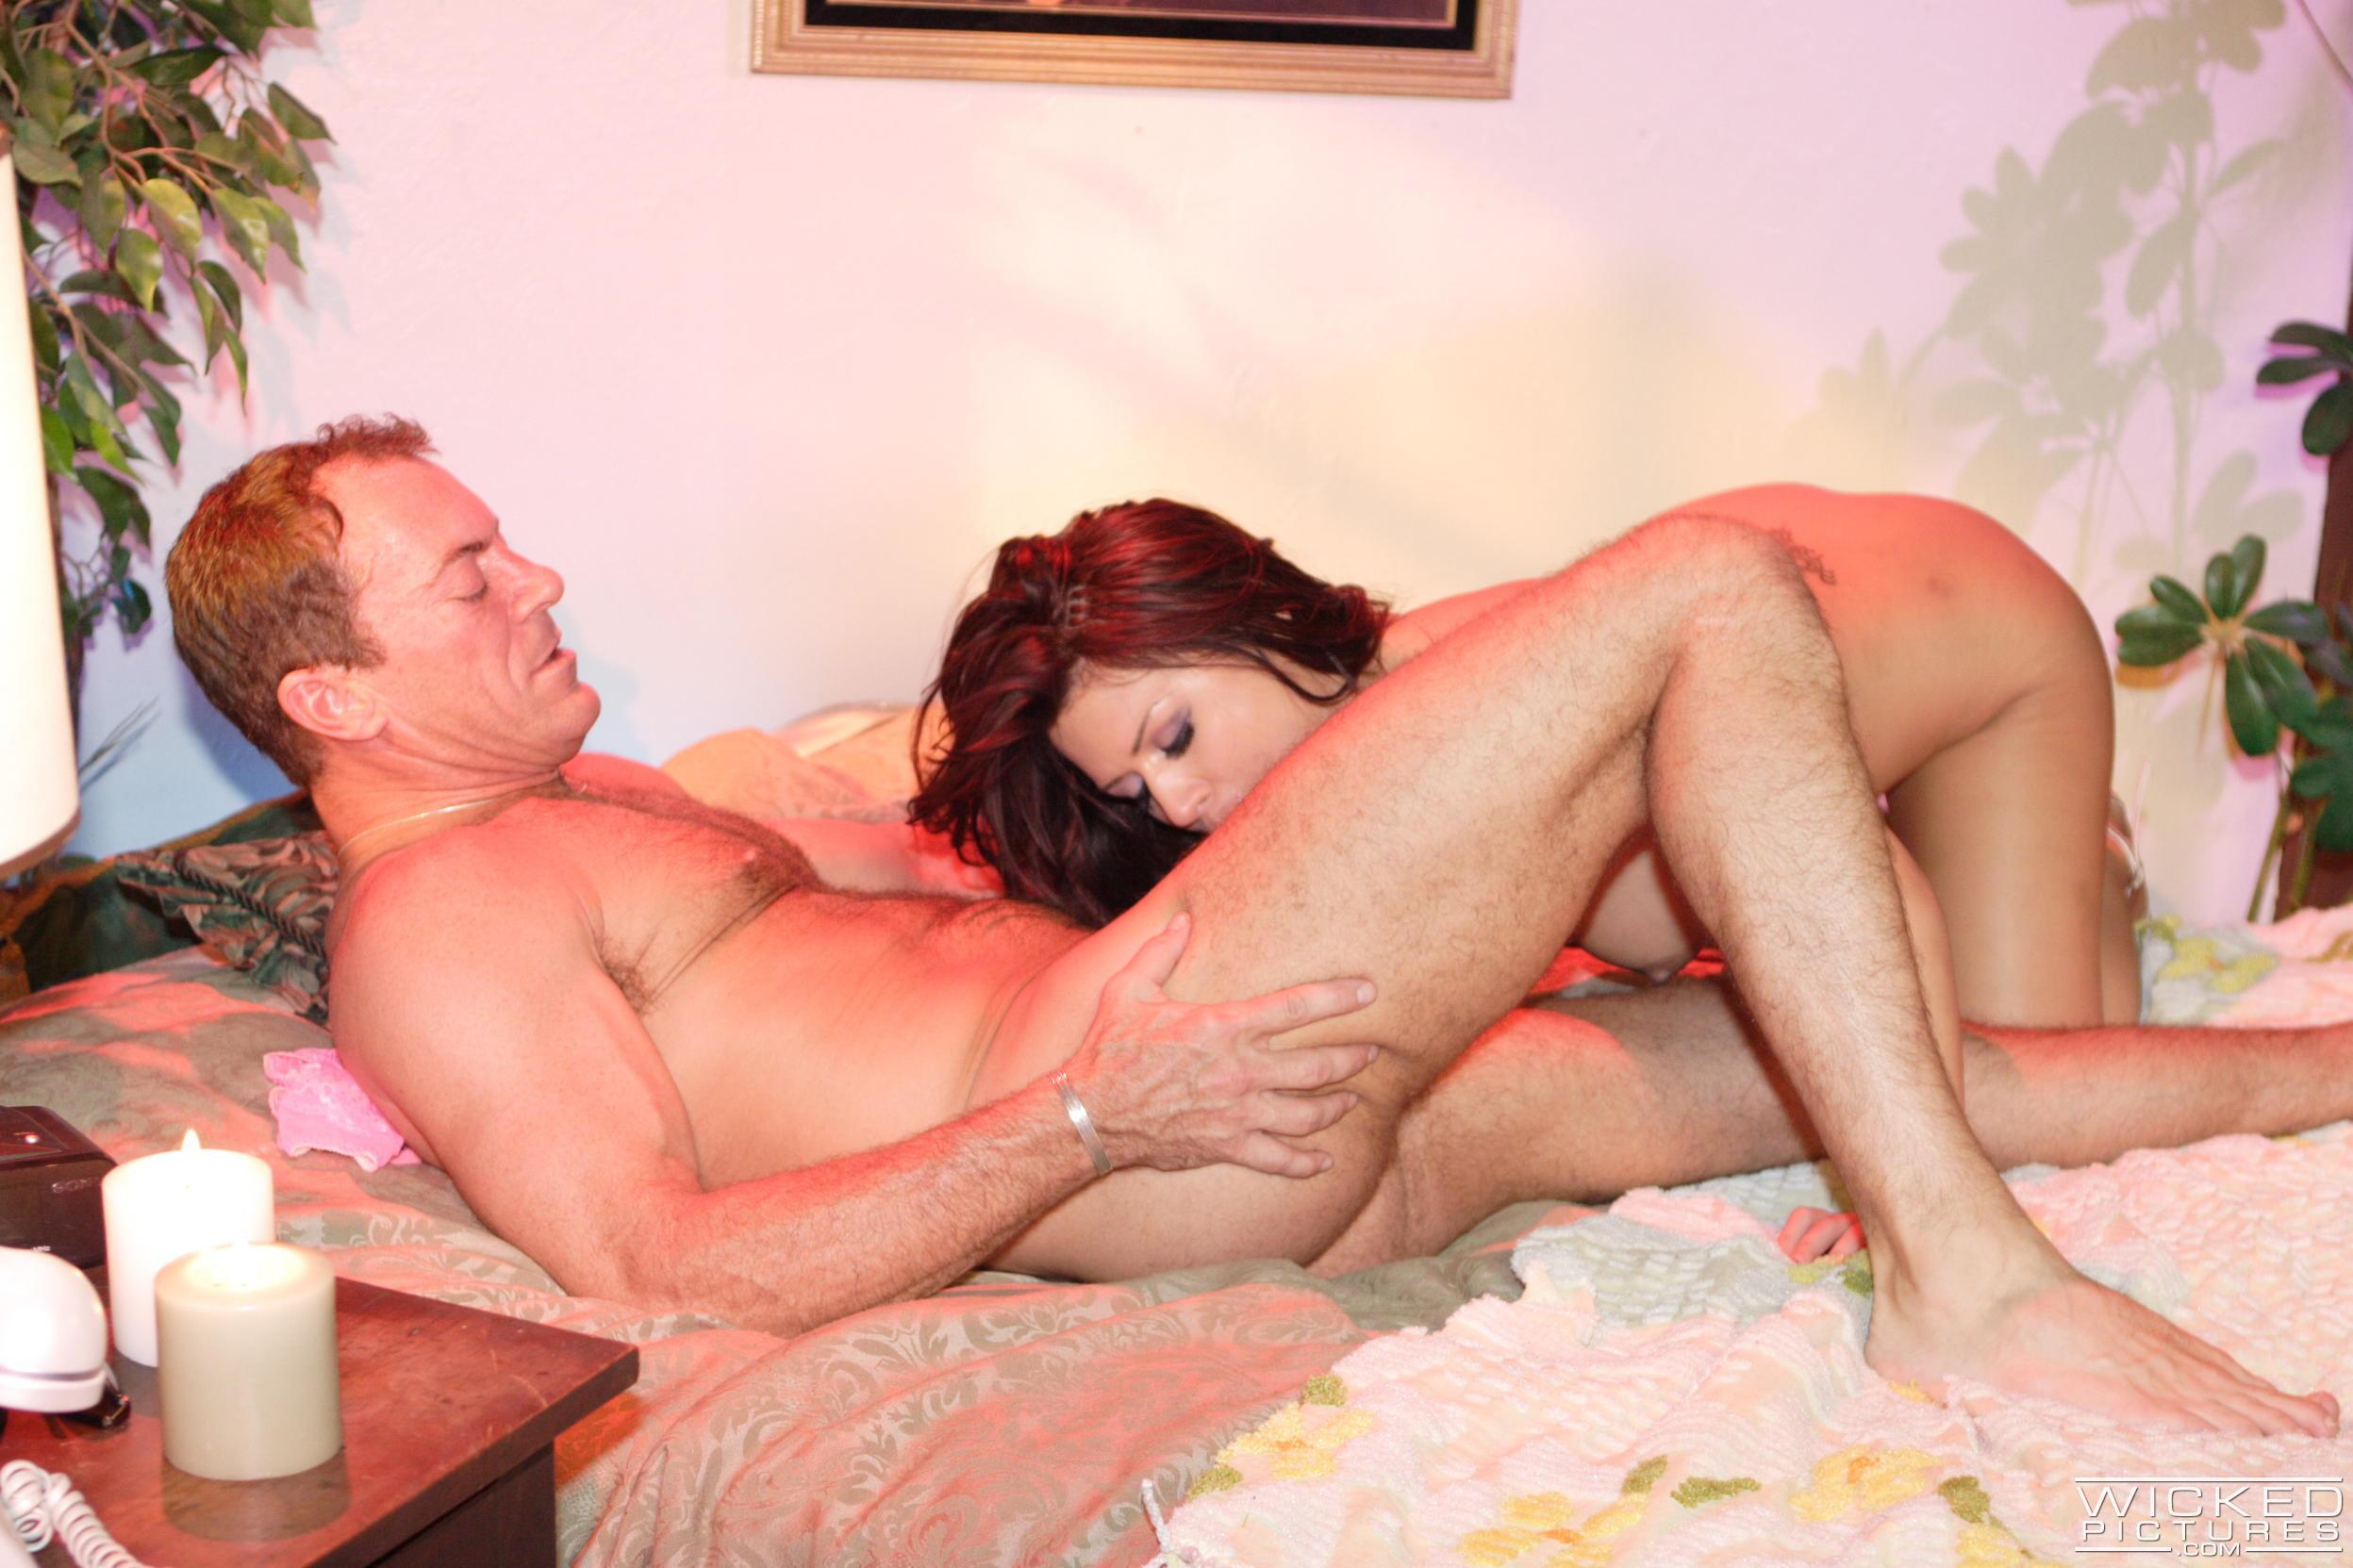 Wicked 'Love Is Blue Scene 1' starring Eva Angelina (Photo 36)